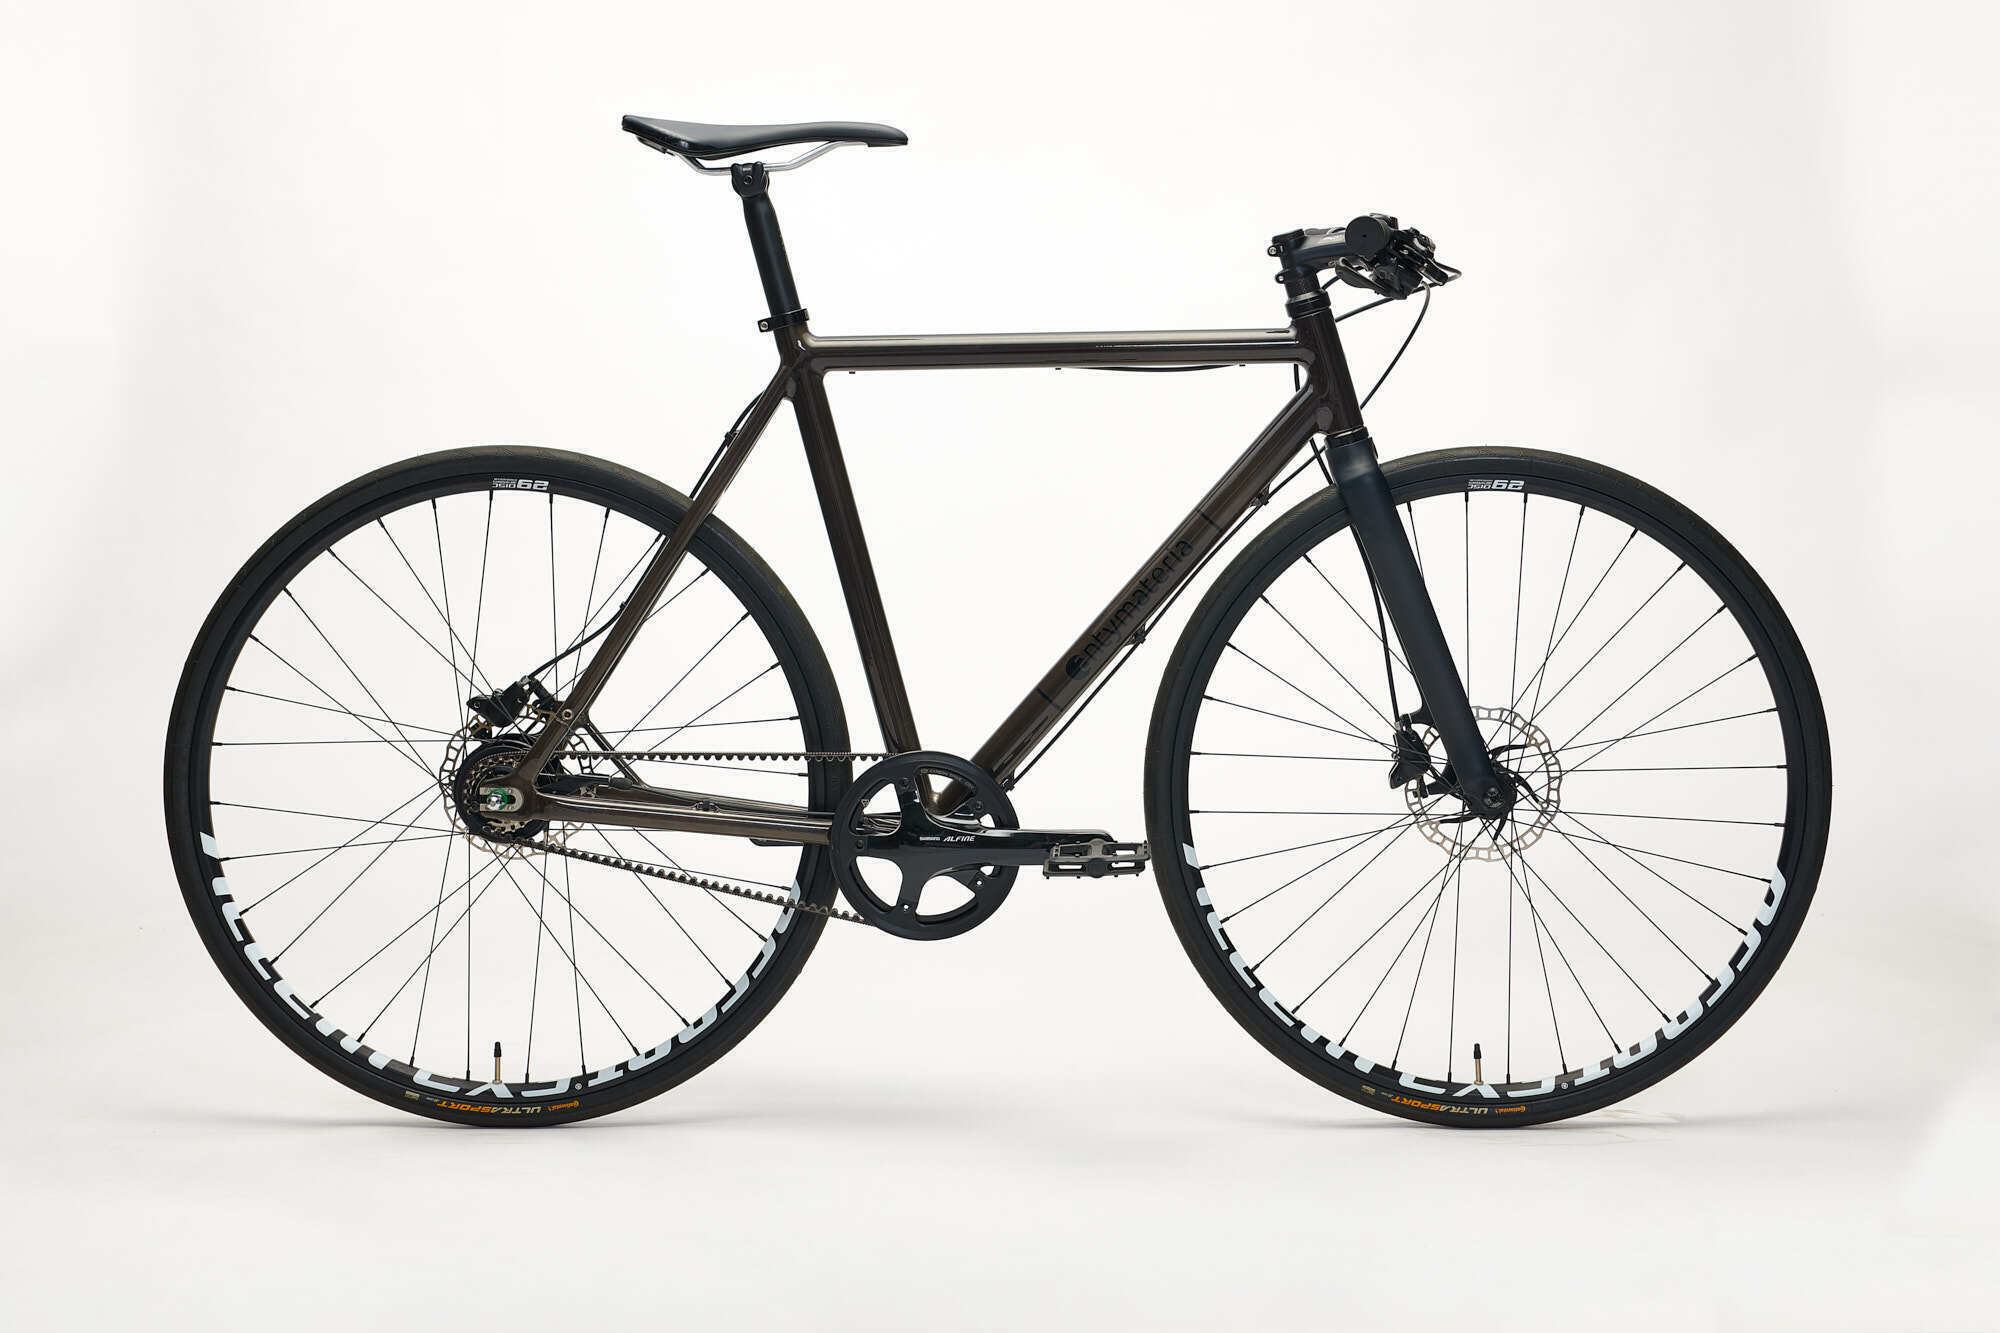 Aluminiowy rower na pasku